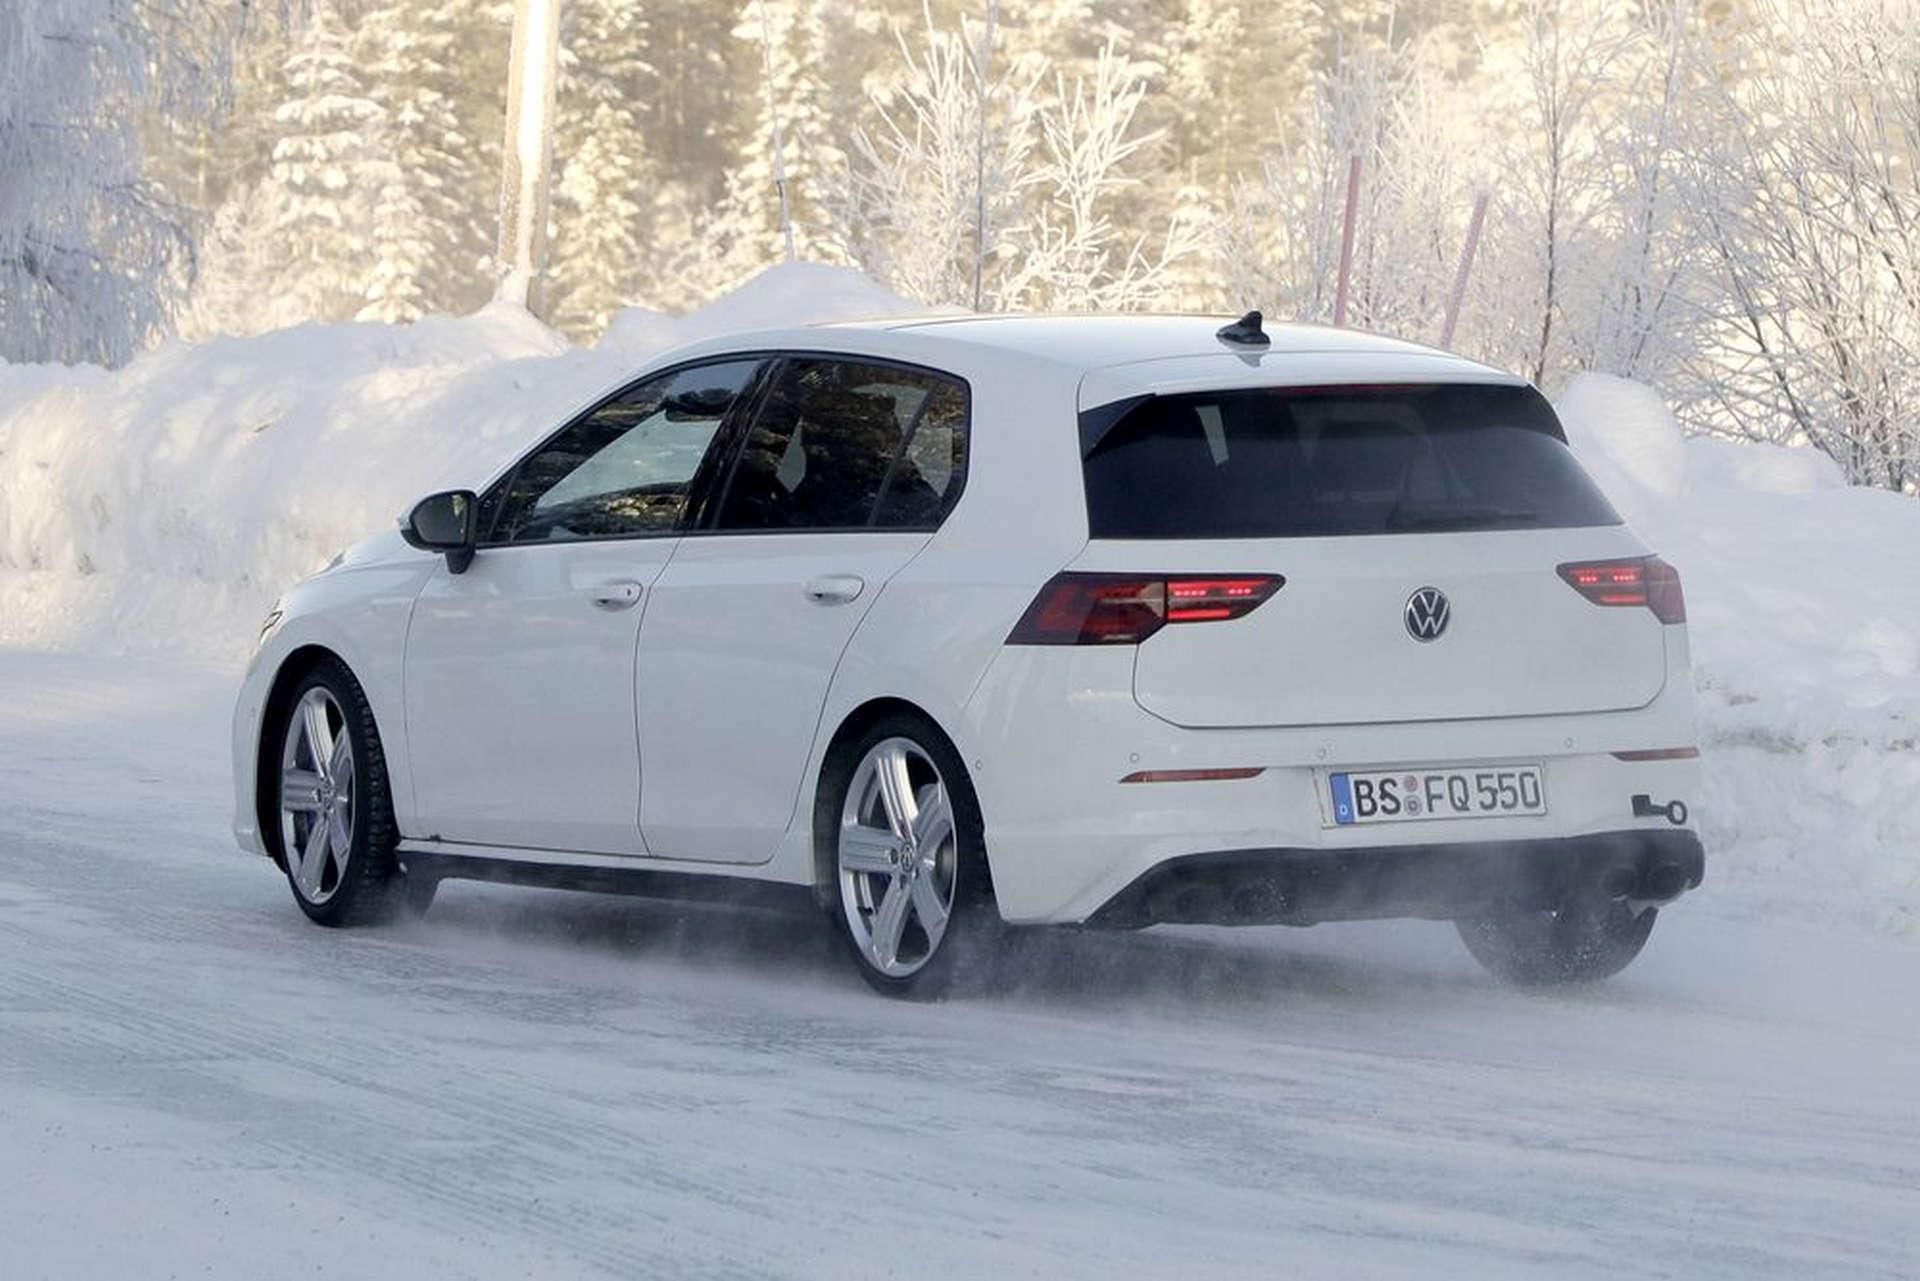 Volkswagen MK8 Golf R Spy Shots Testing Rear End